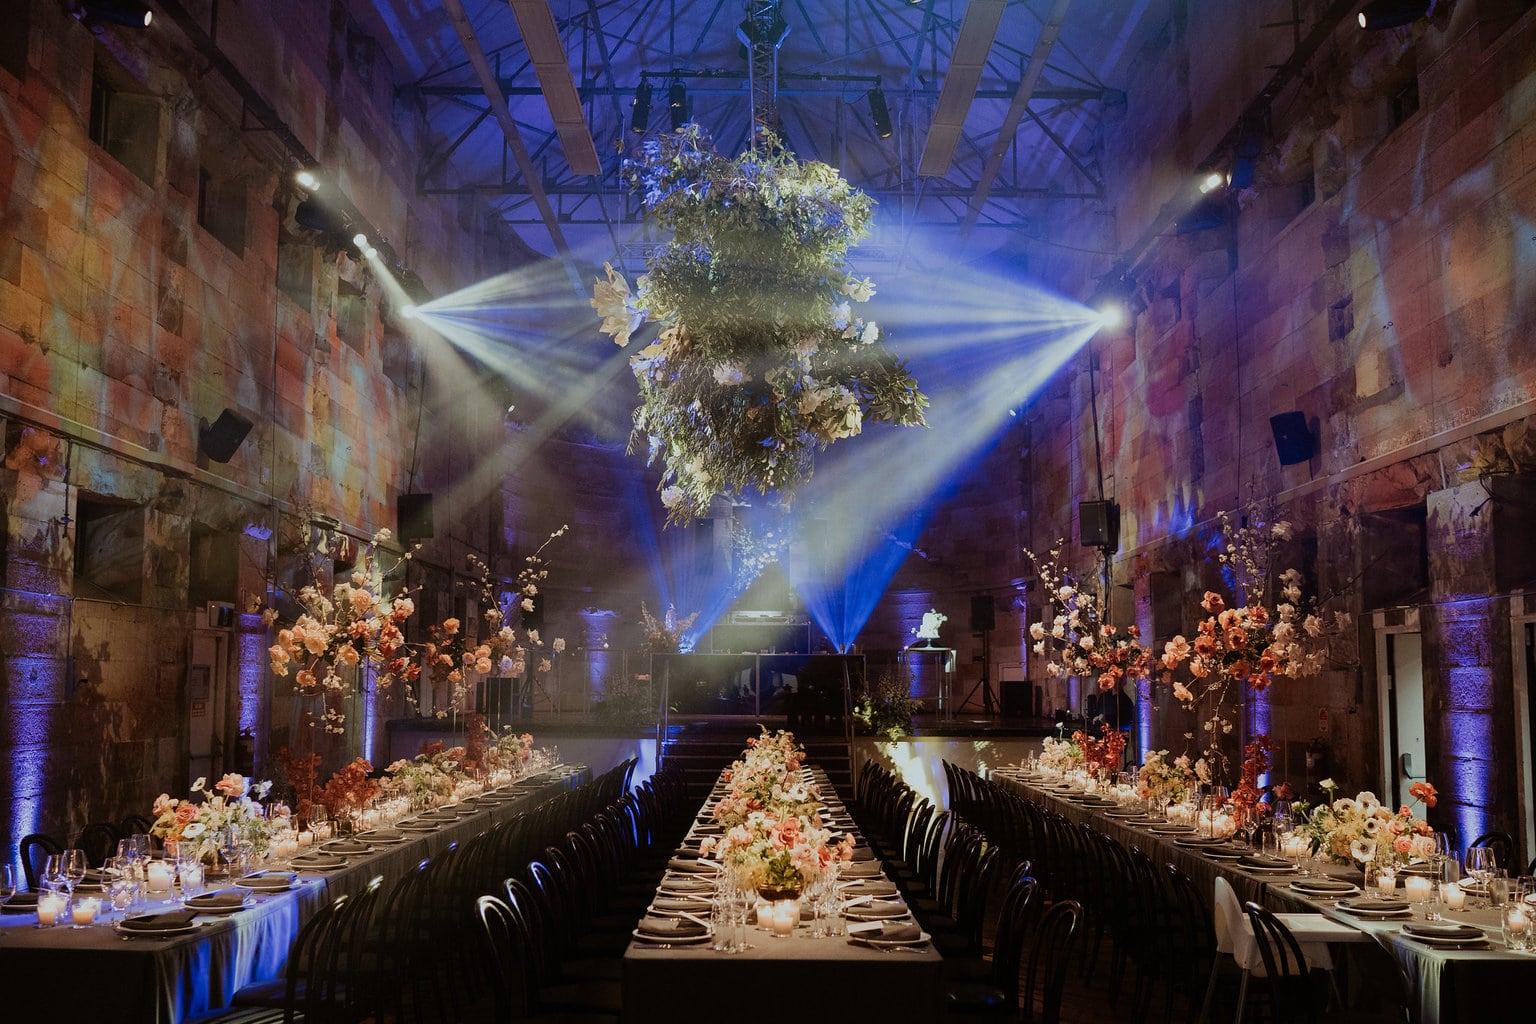 Jk Co. Events Shorter Evening Wedding